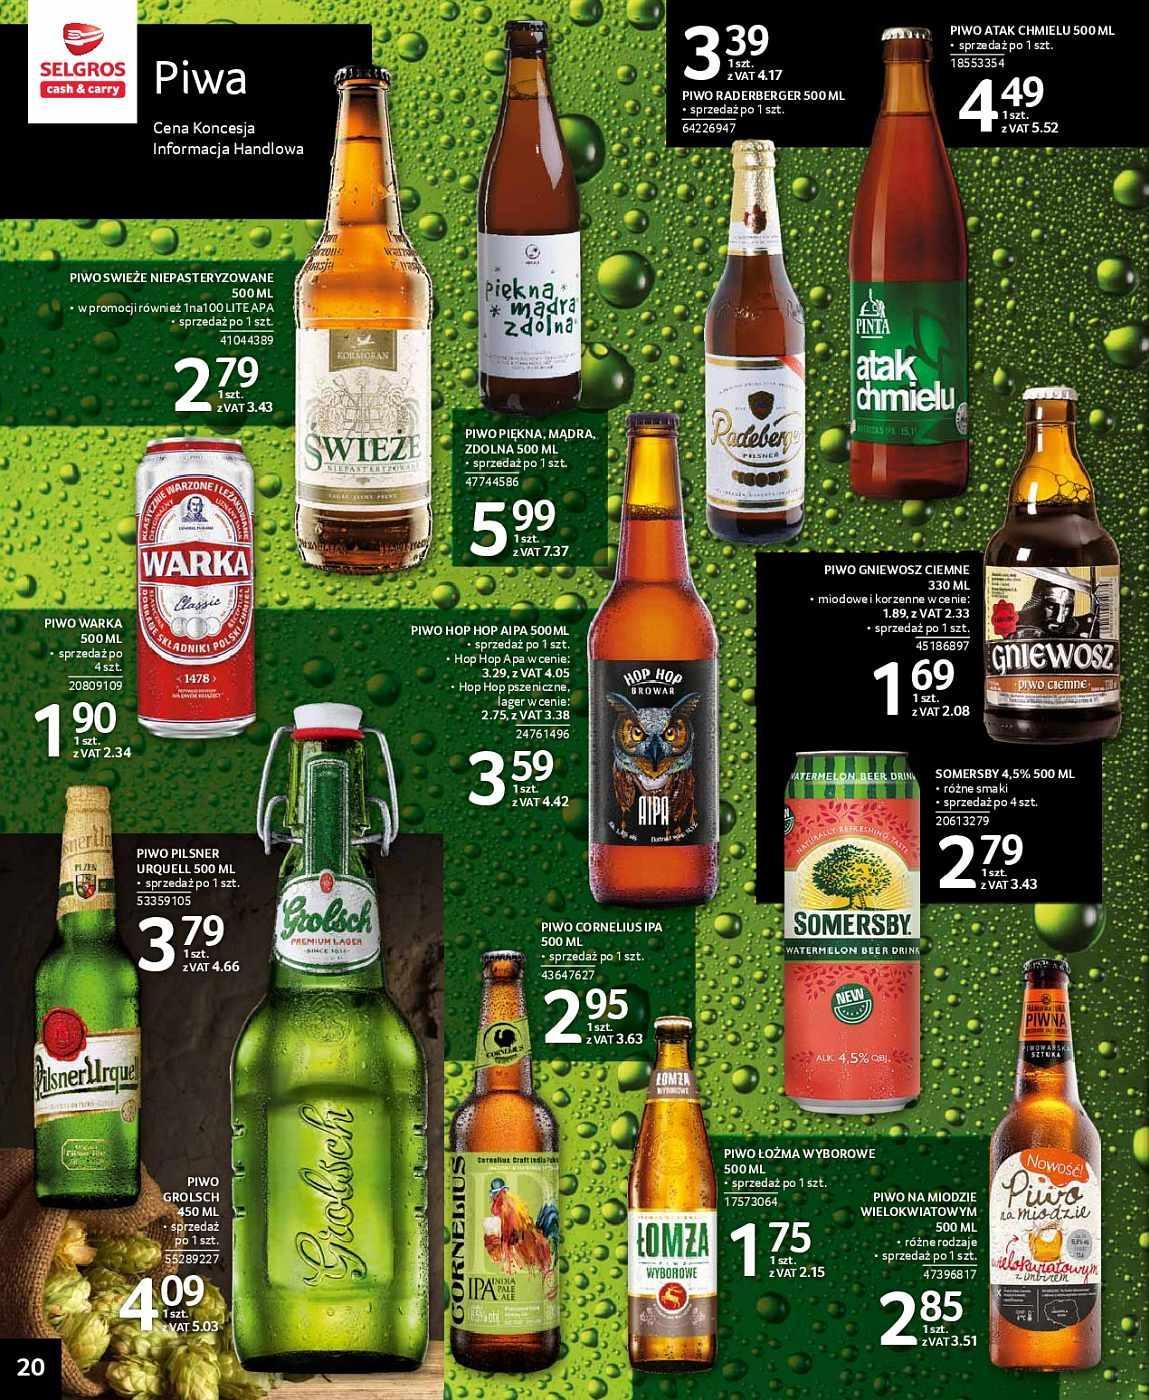 Piwo Pinta Atak Chmielu 500 ml - 5,52 zł,  Hop Hop AIPA - 4,42 zł, Hop Hop APA - 4,05 zł @ Selgros